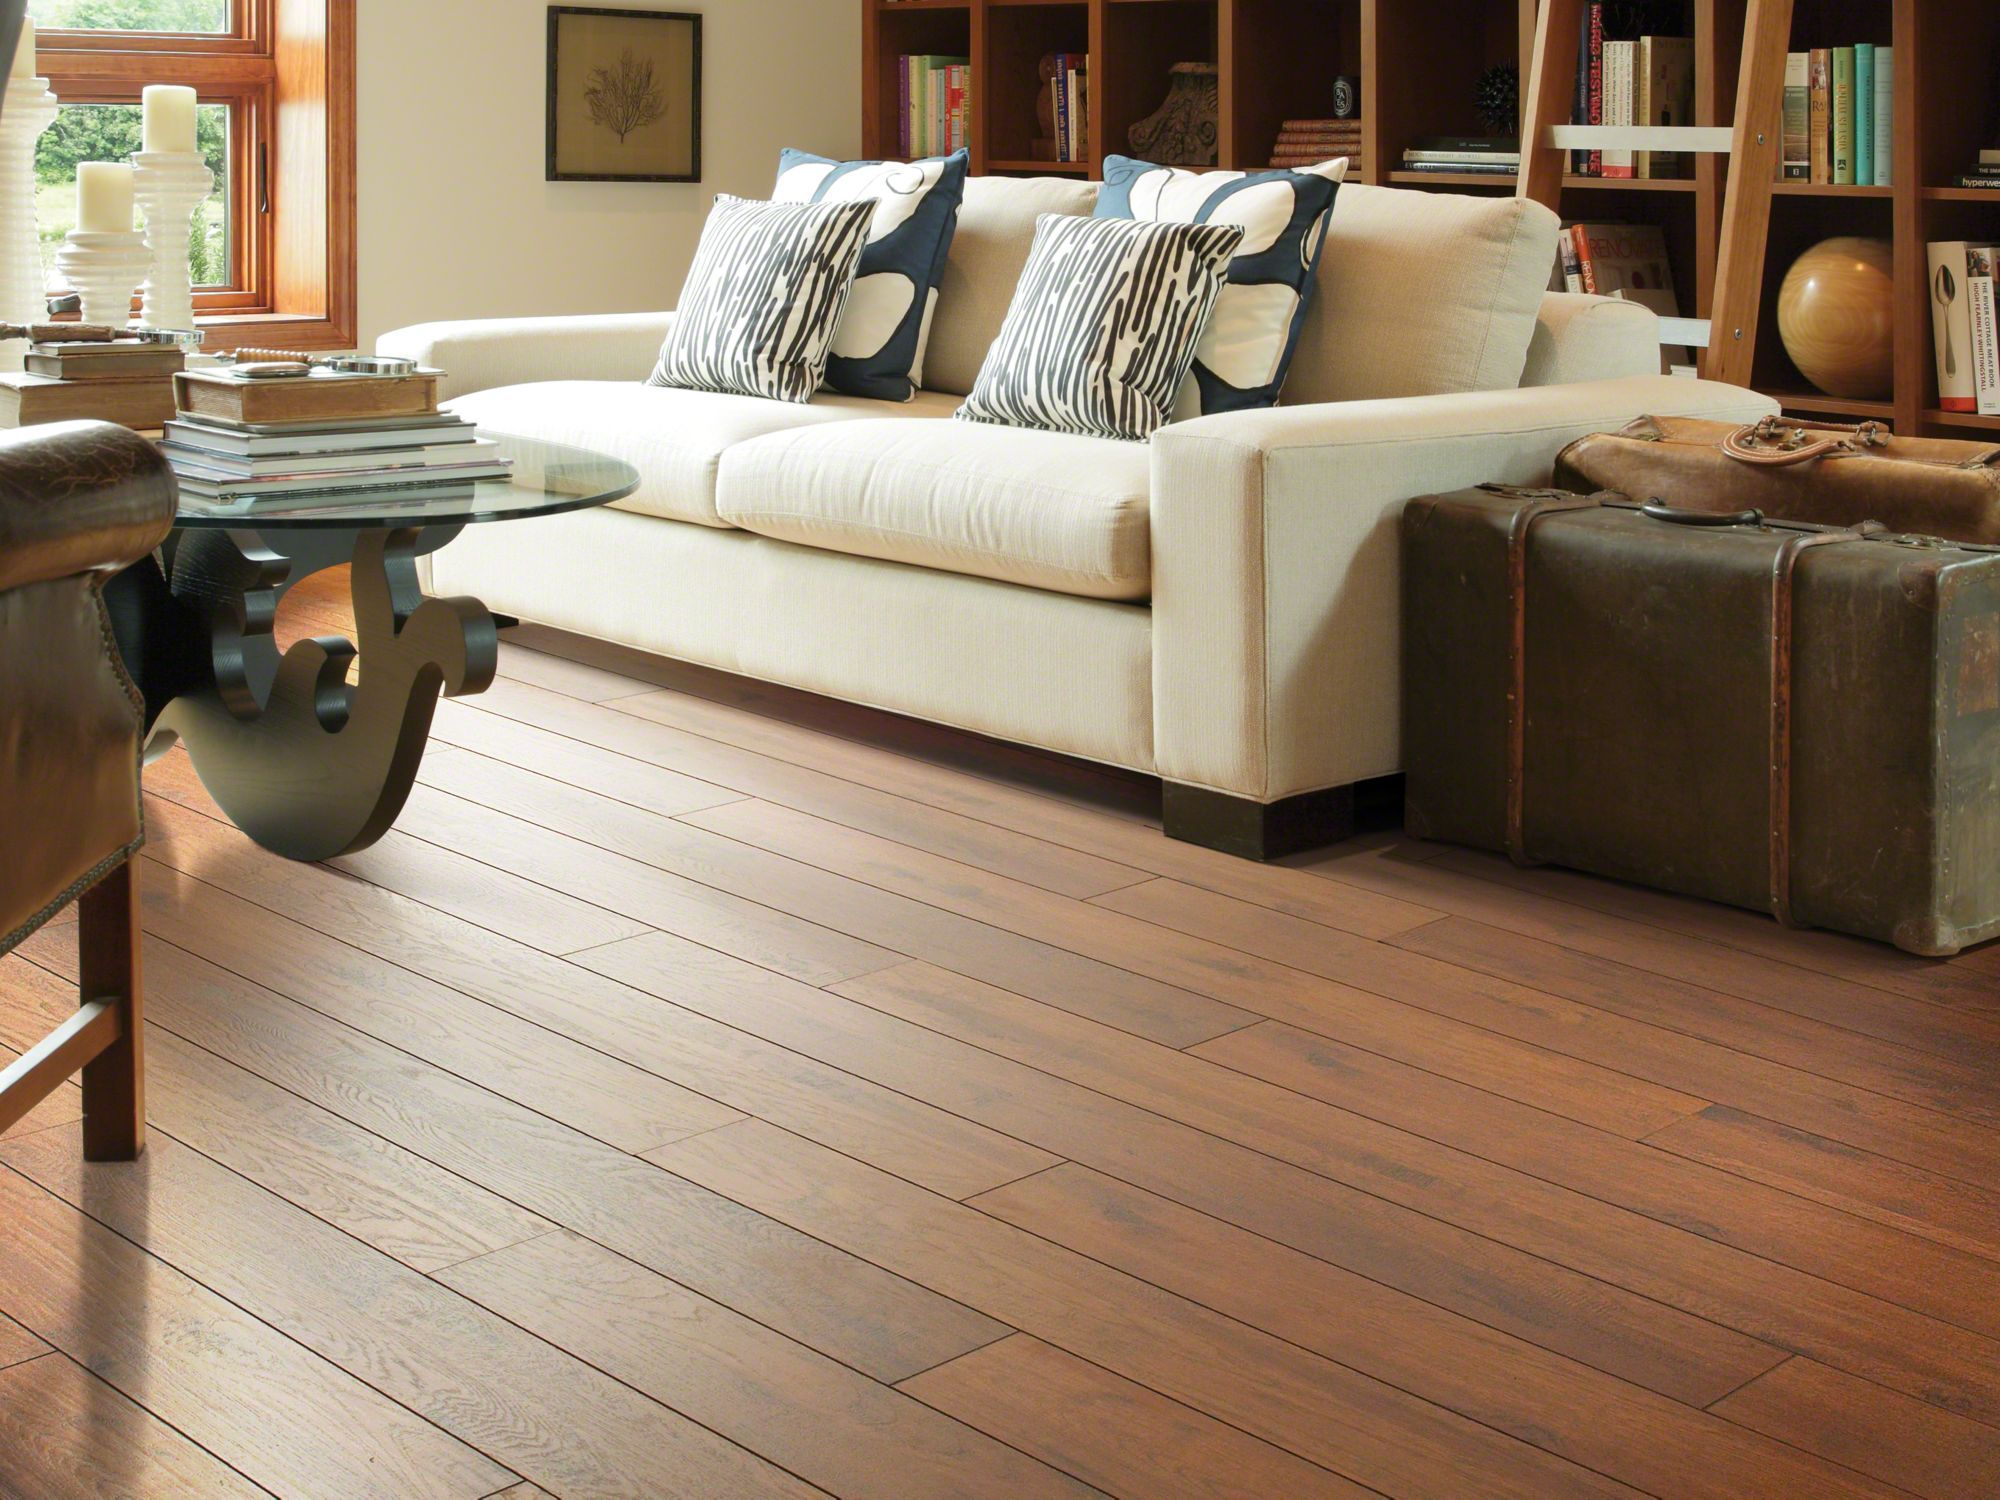 How to Clean Laminate Floors Wood laminate flooring